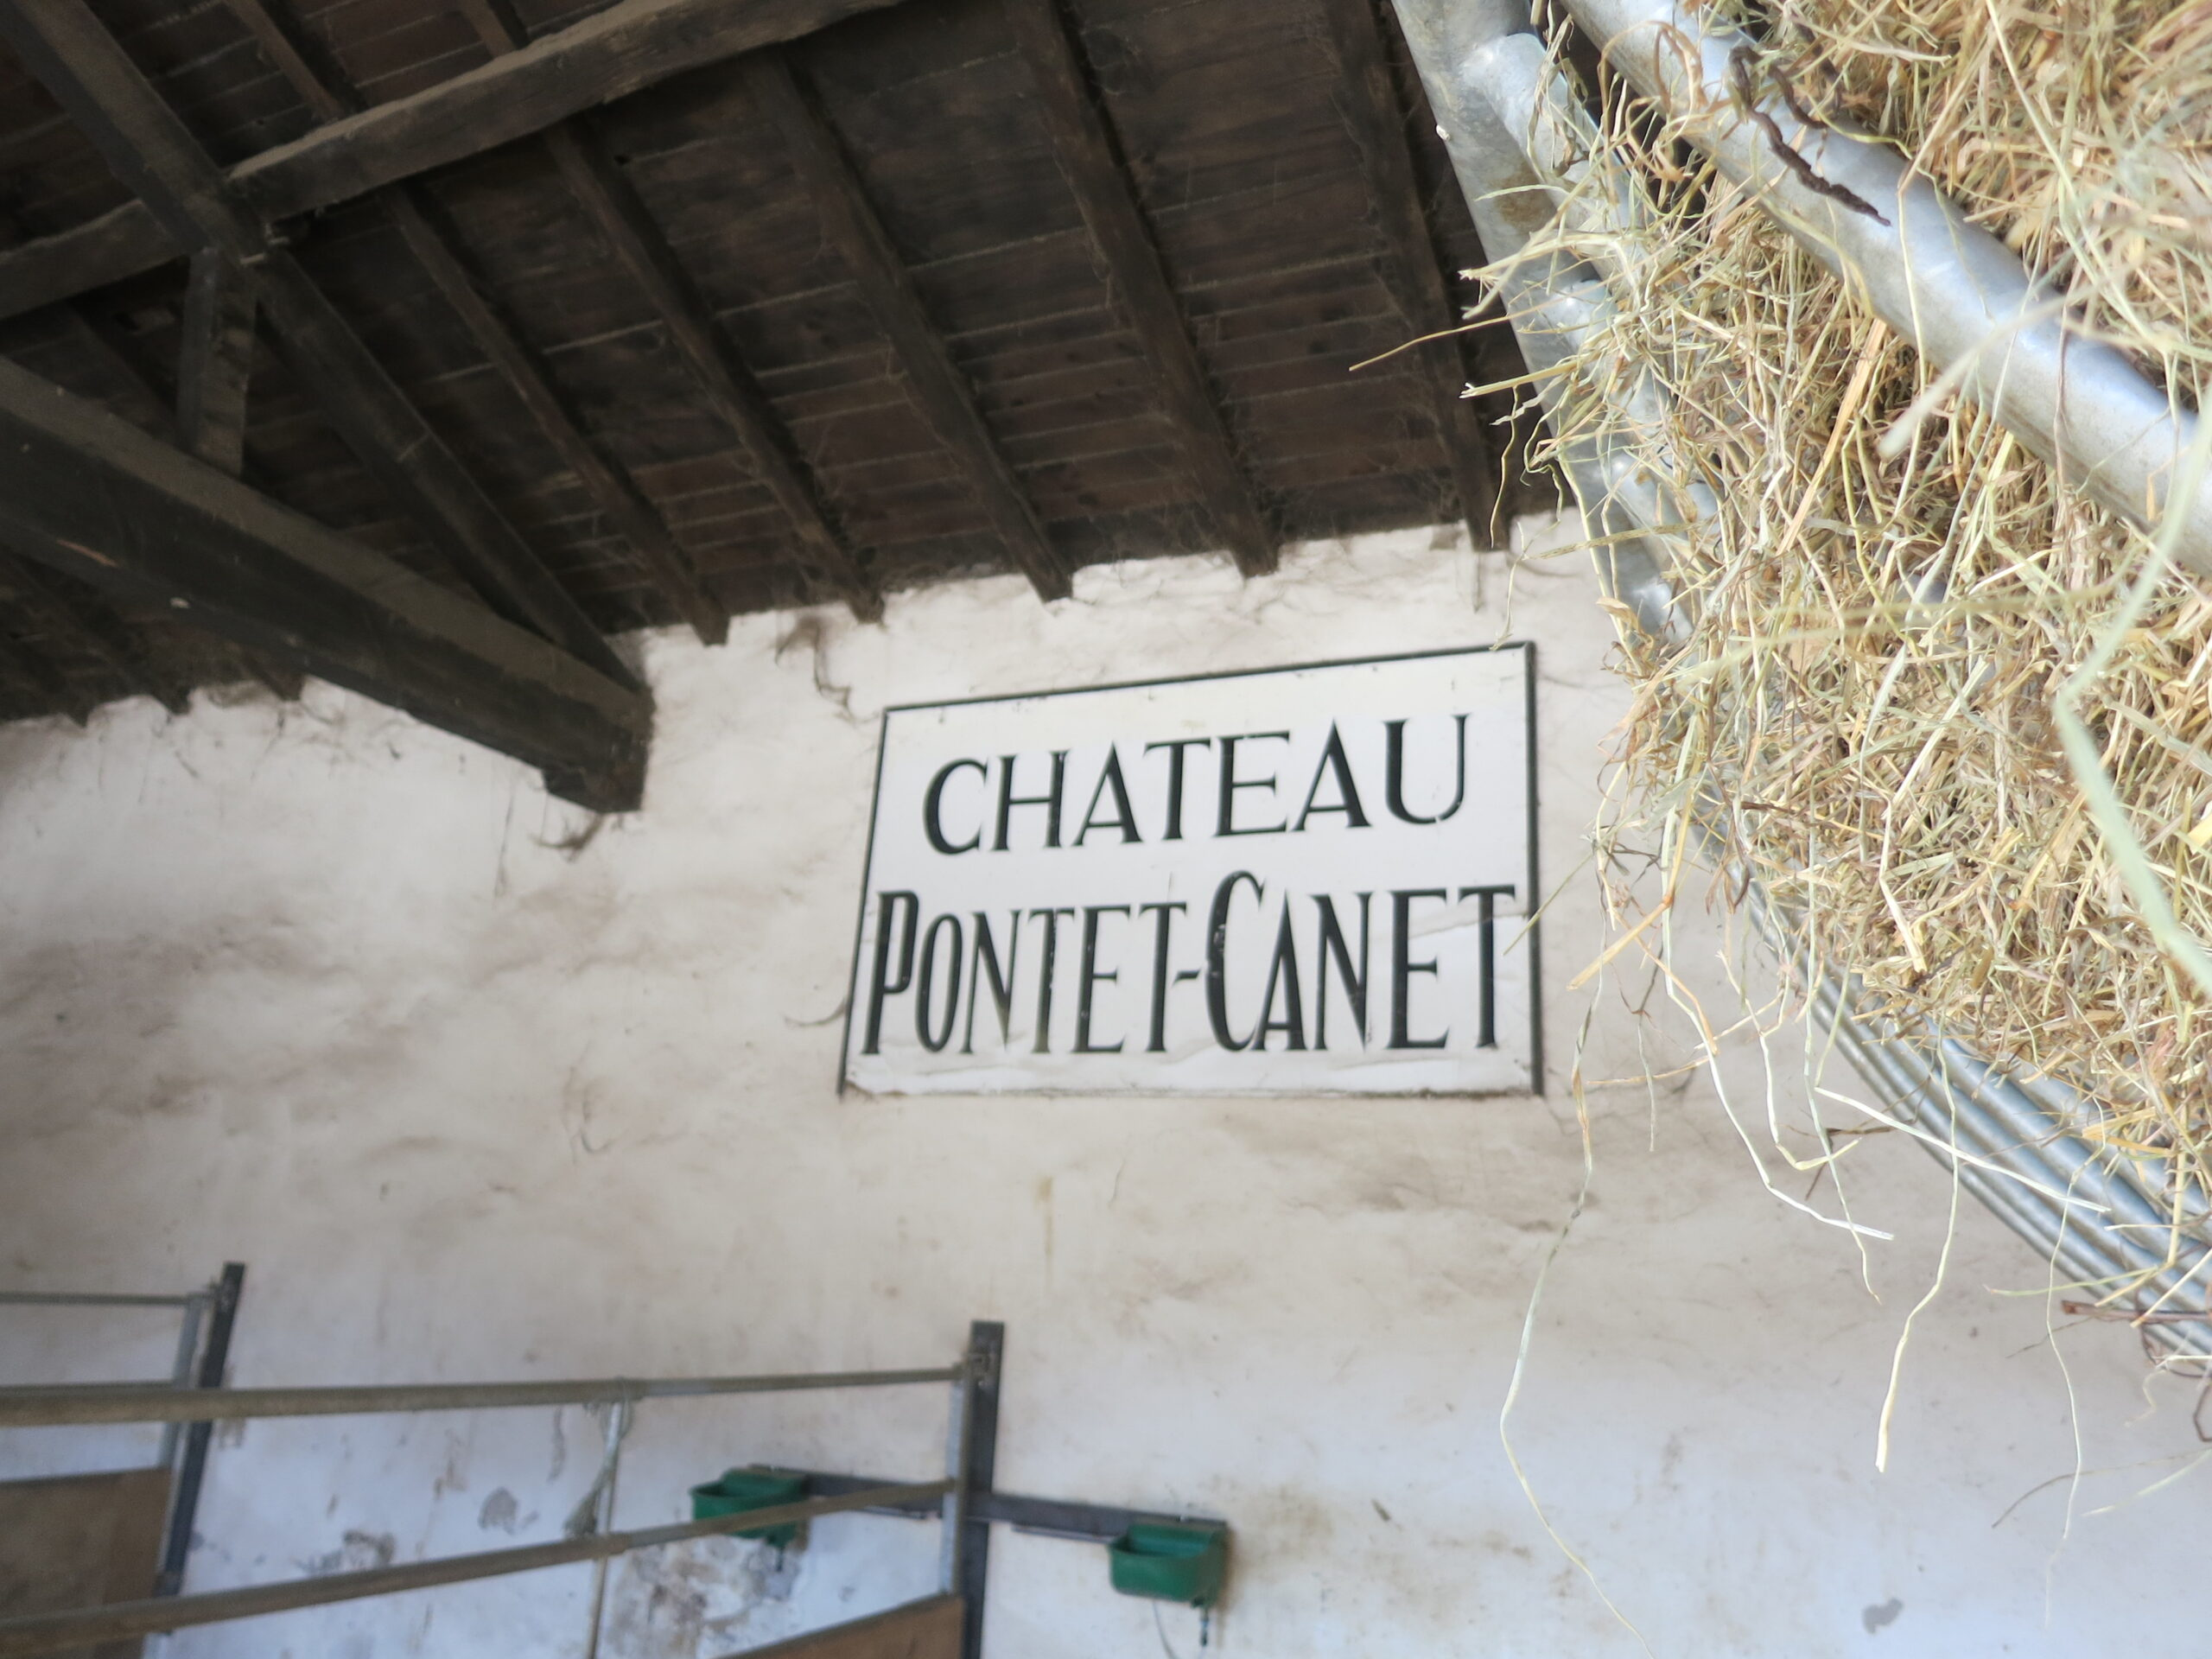 Pontet Canet Bordeaux Wine Producer Tesseron hits big in 2010